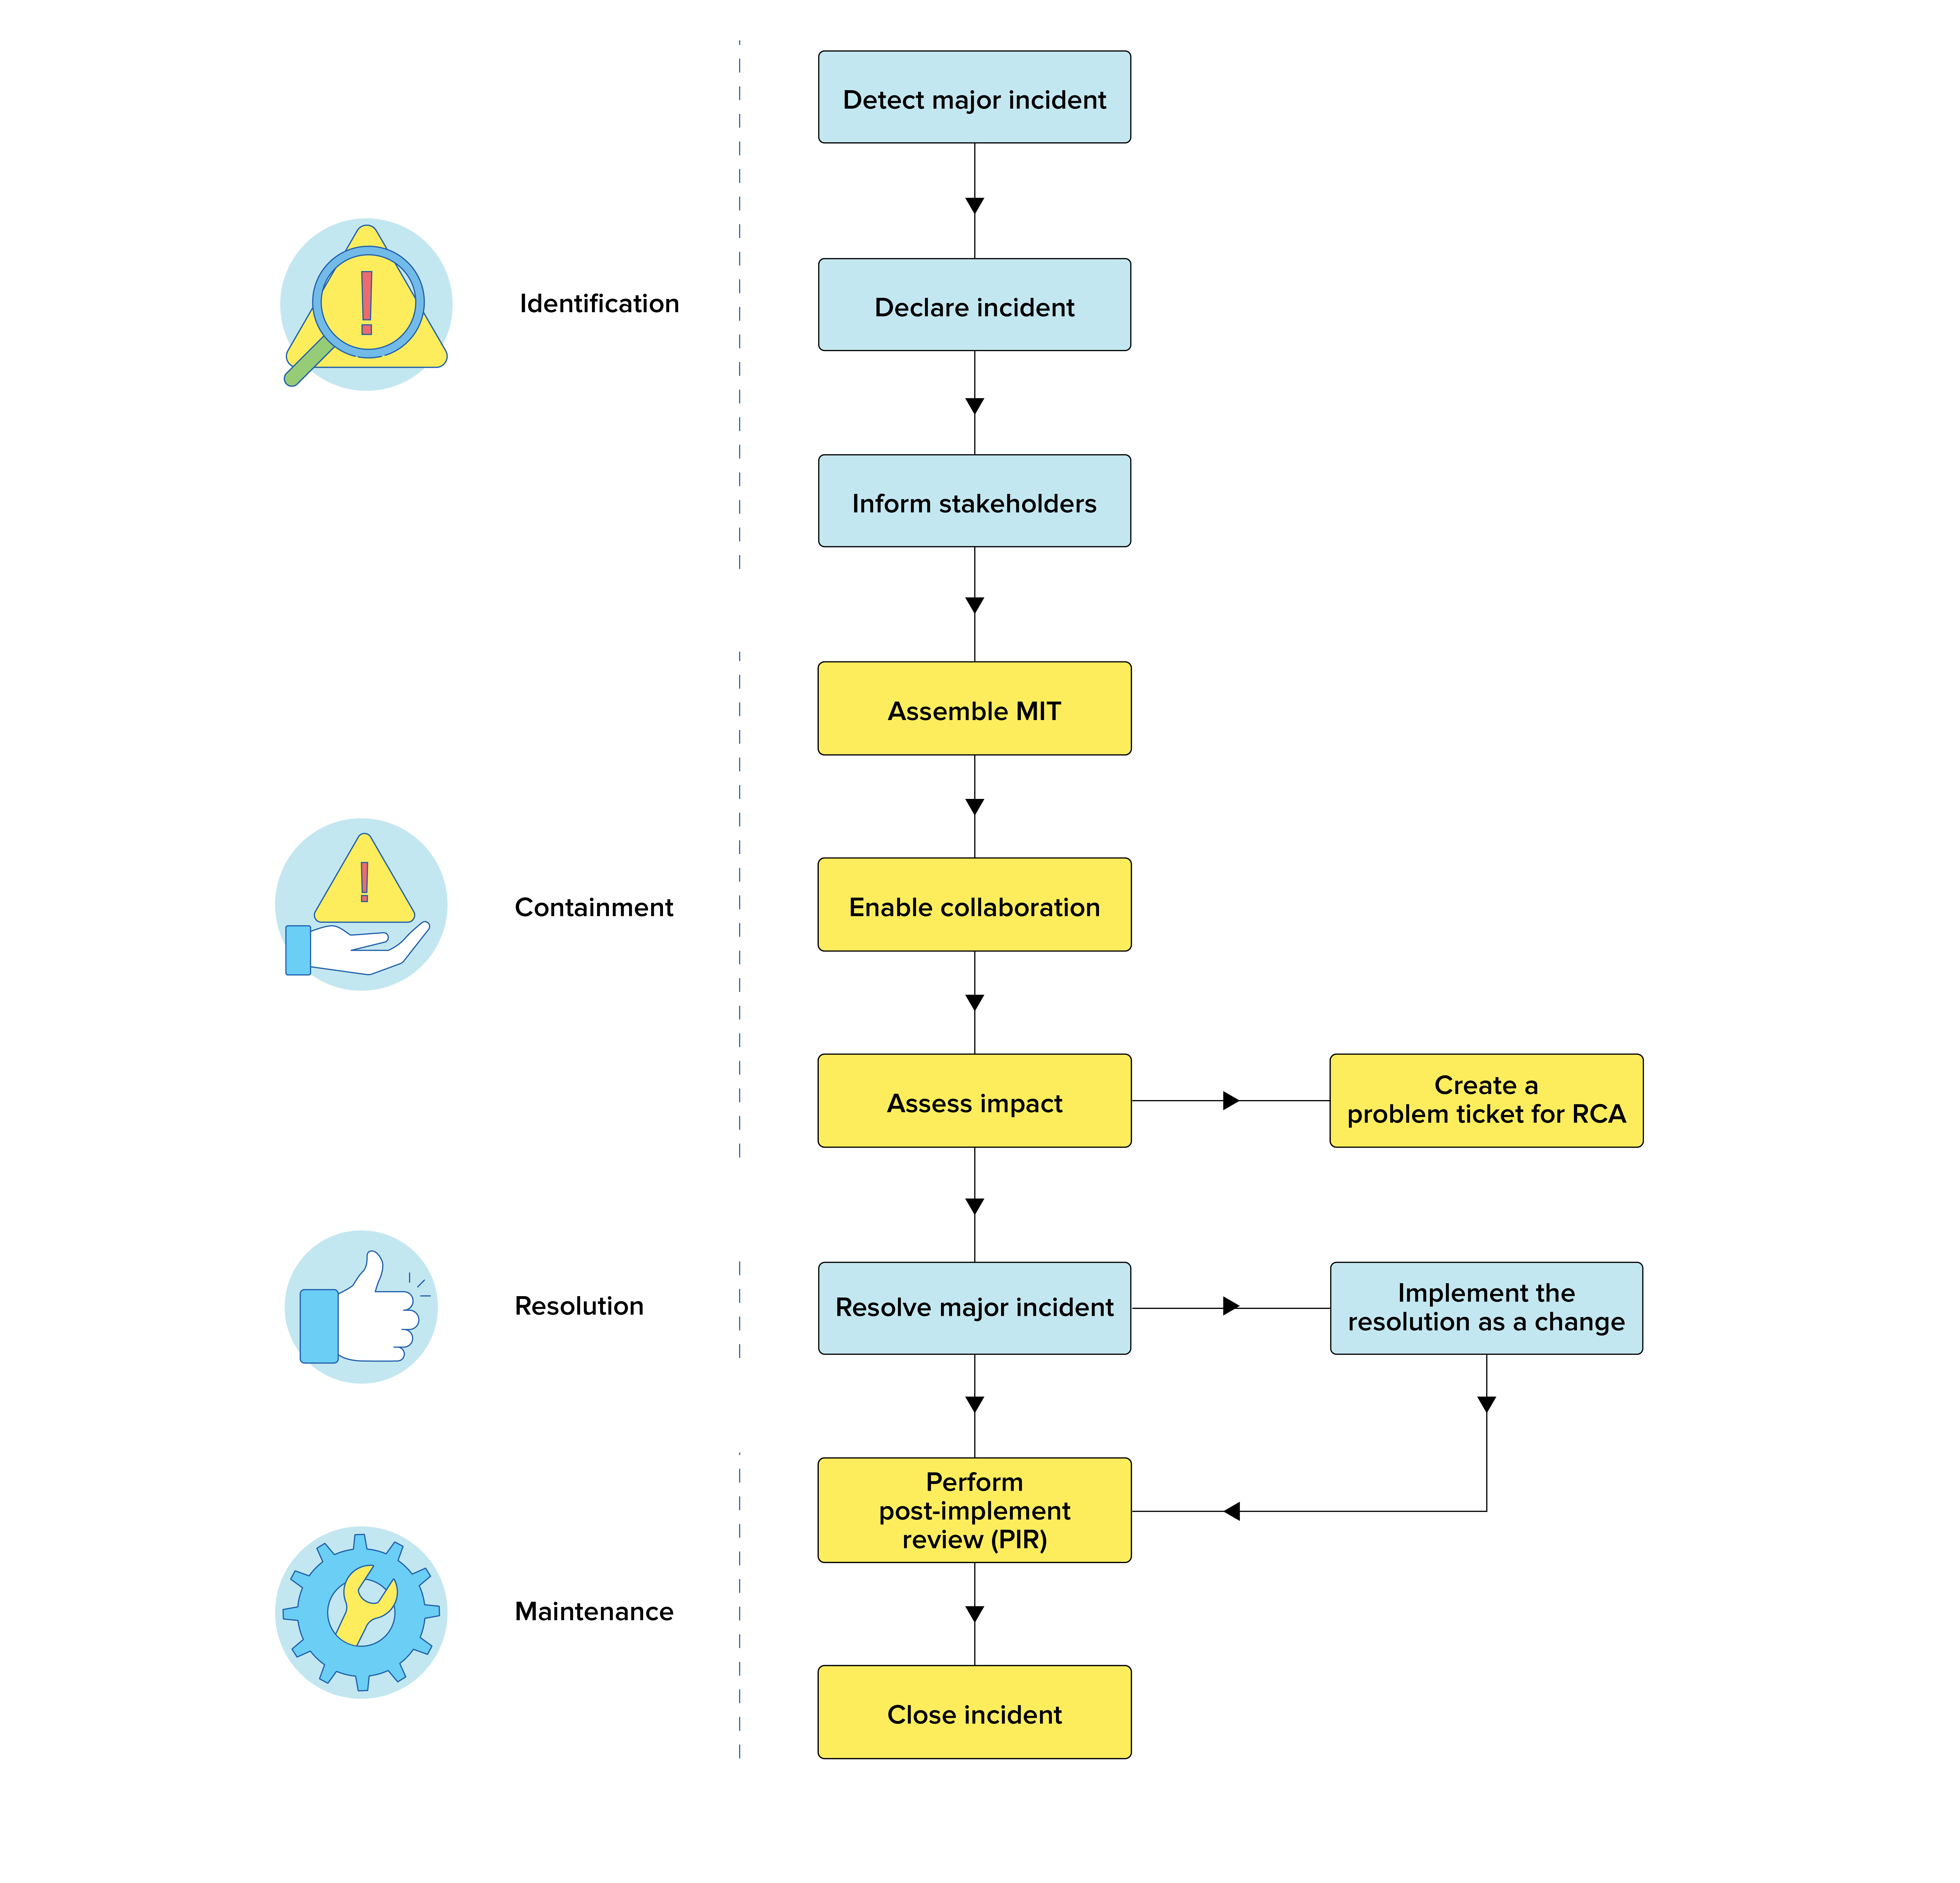 ITIL 중대 사건 관리 프로세스 플로우 차트